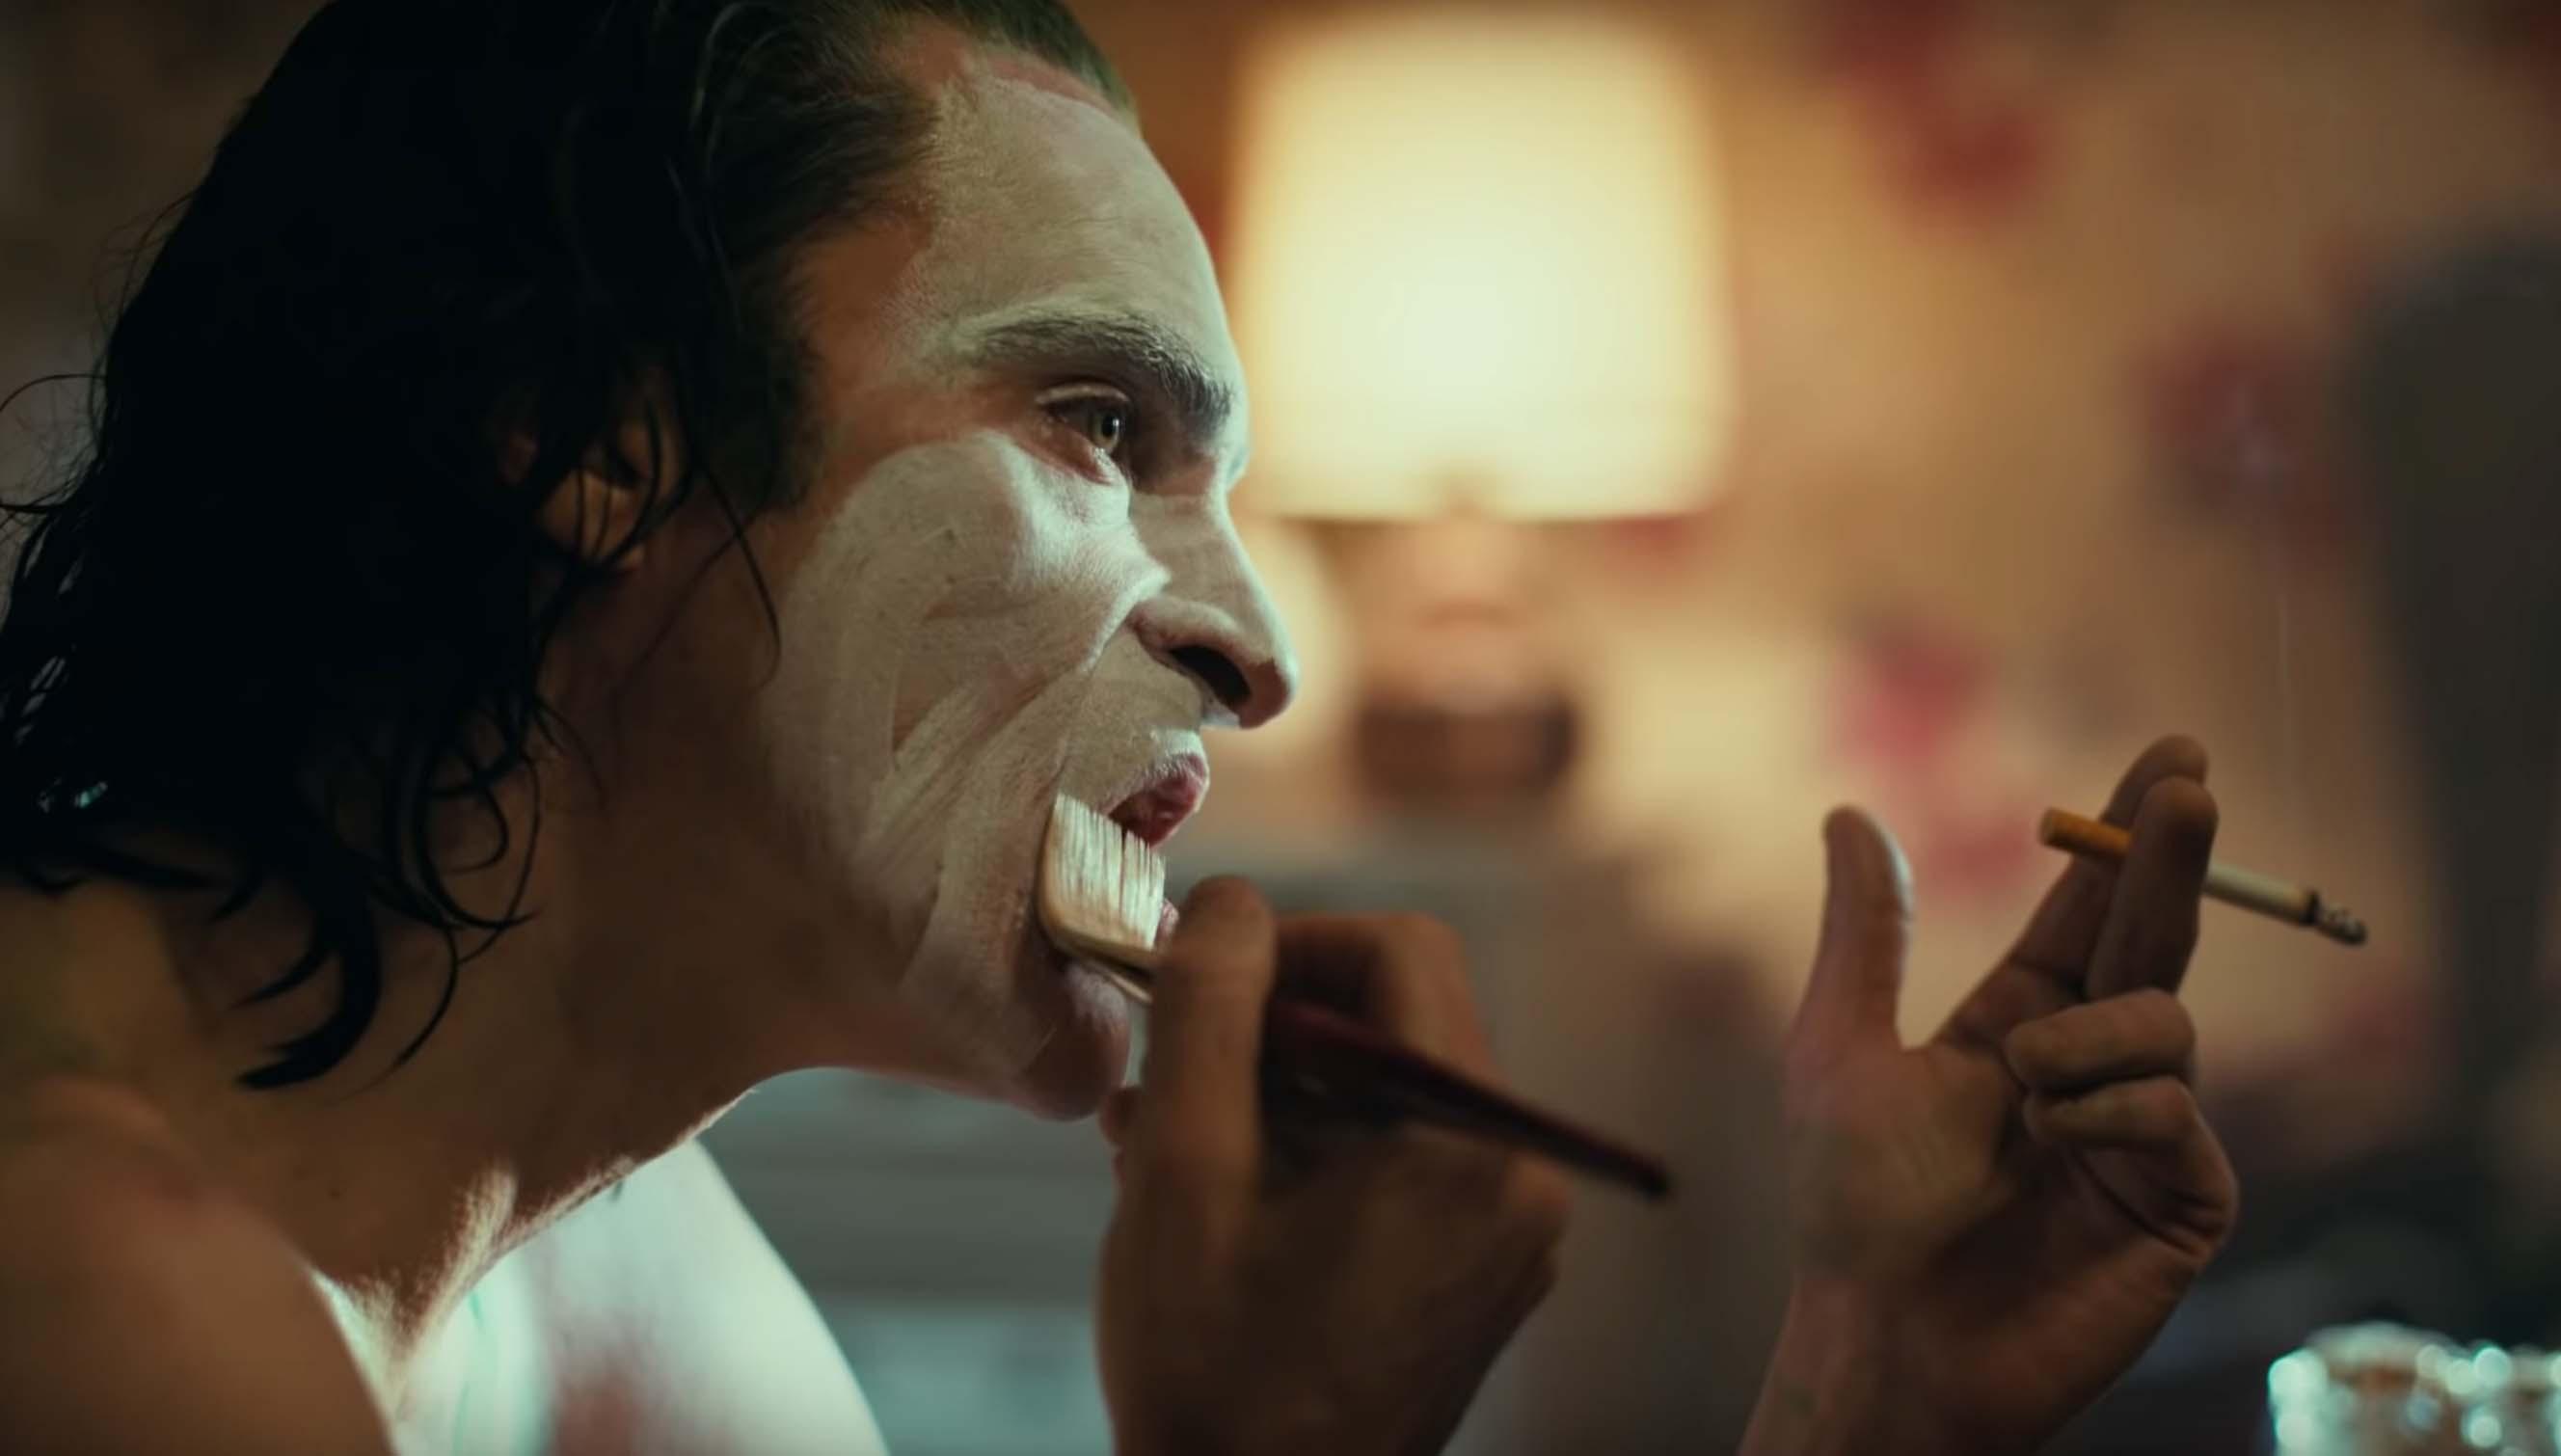 Joker film review post image controller companies